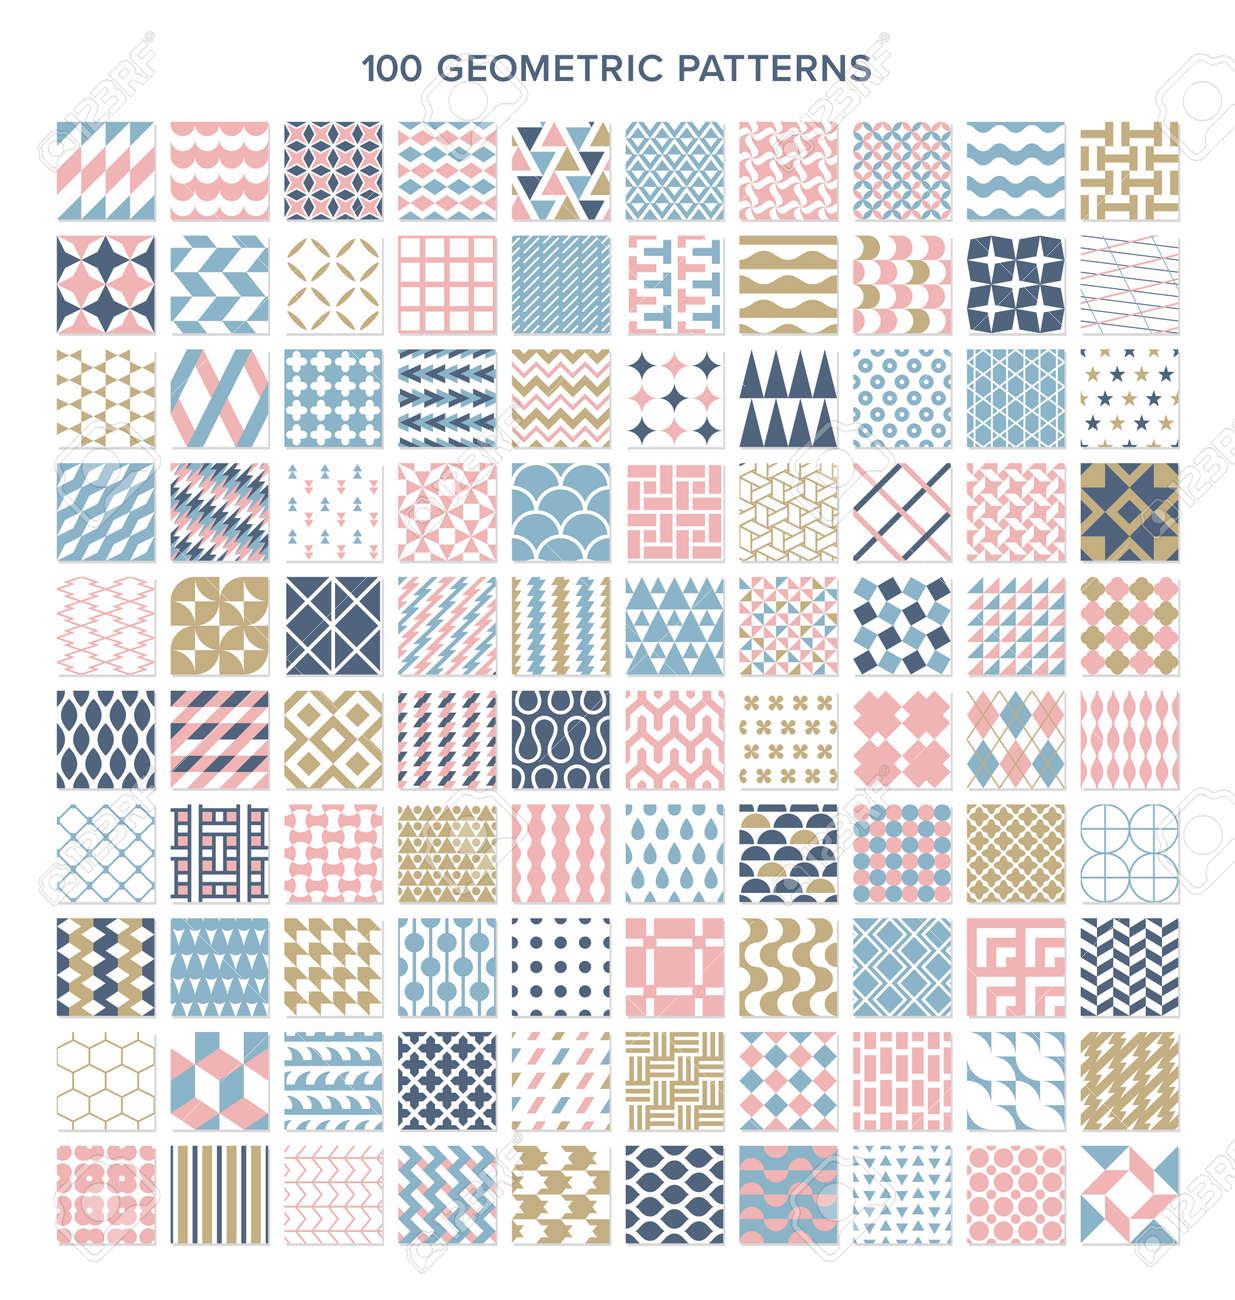 Seamless patterns with 100 geometric patterns - 168346976